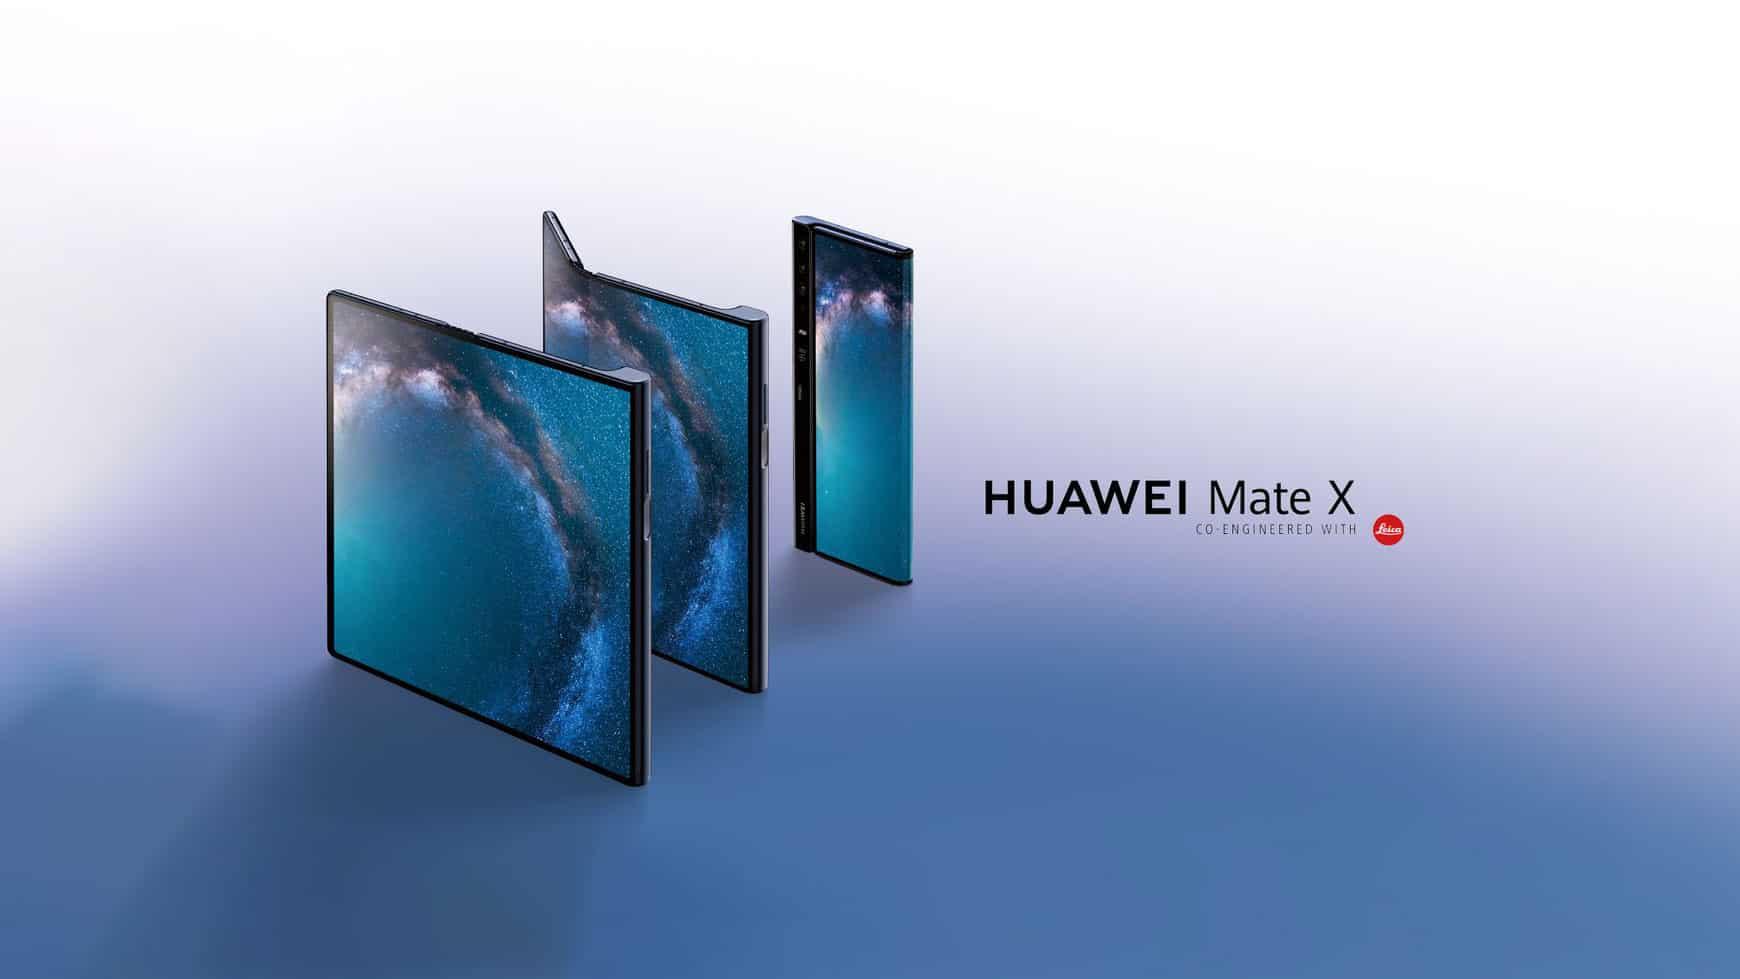 Huawei Mate X image 13 widened